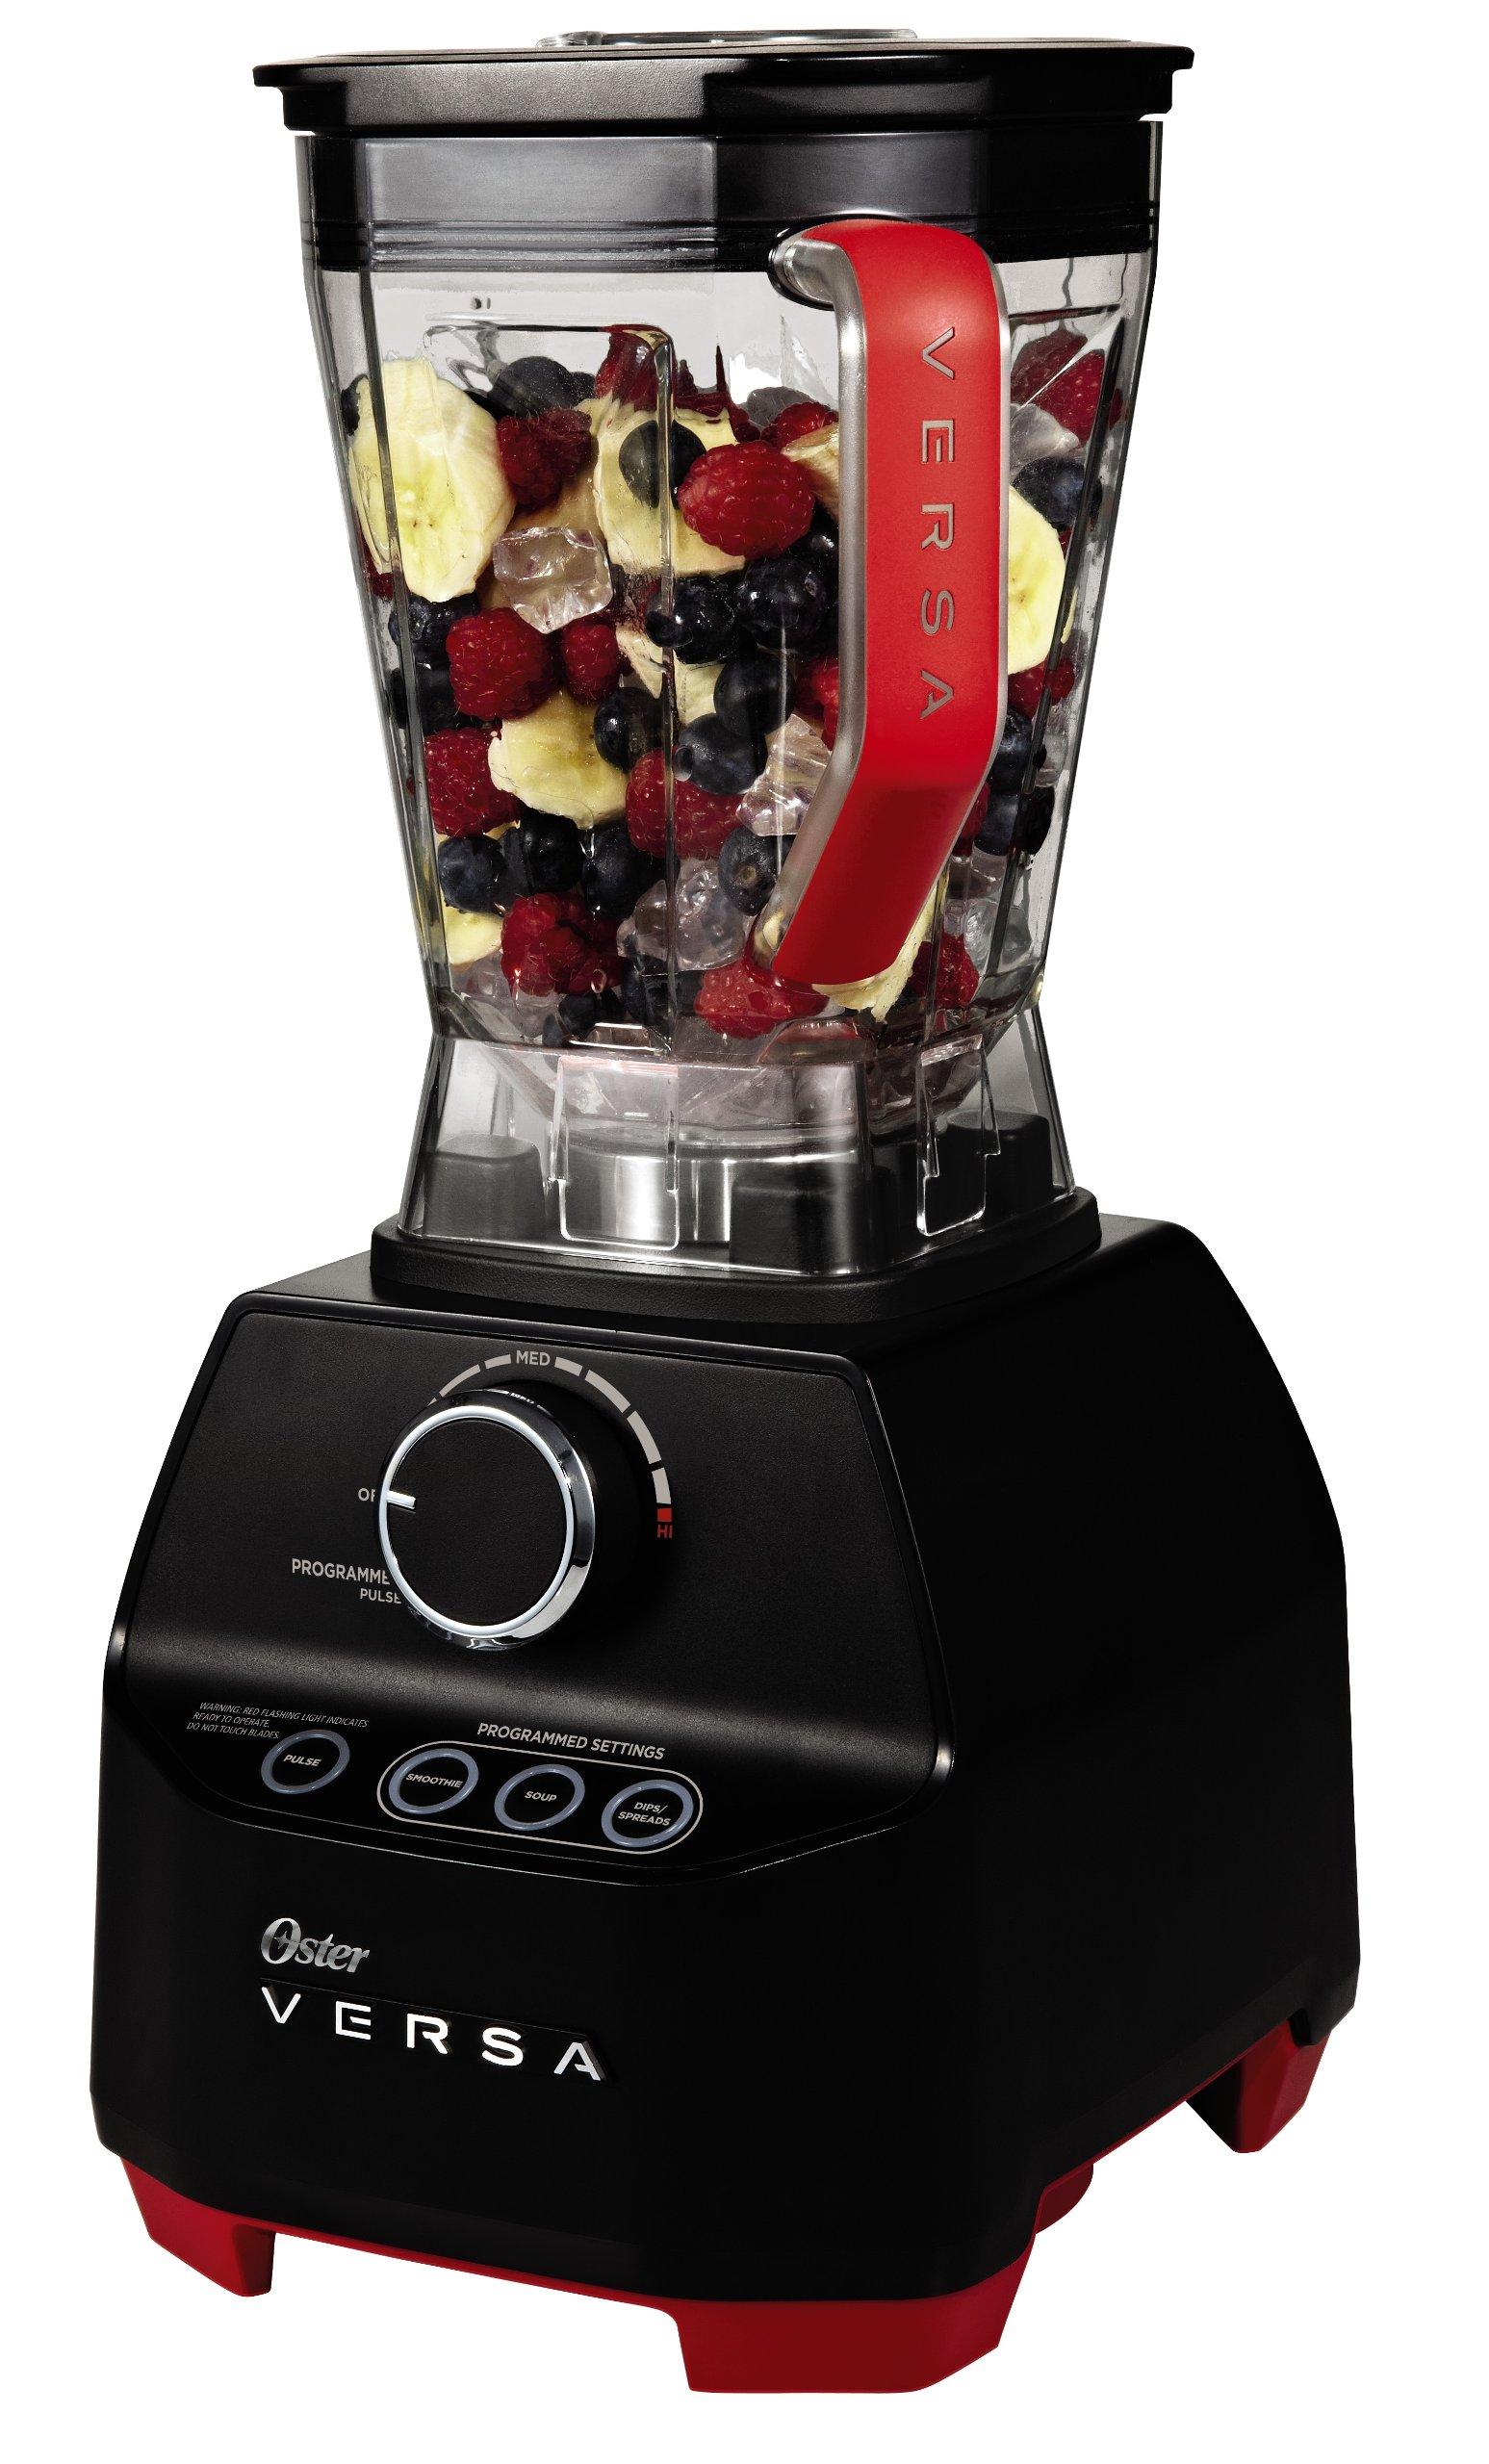 Oster VERSA 1400-watt Professional Performance Blender with Low Profile Jar + Bonus Cookbooks - Best Blender Reviews 2020